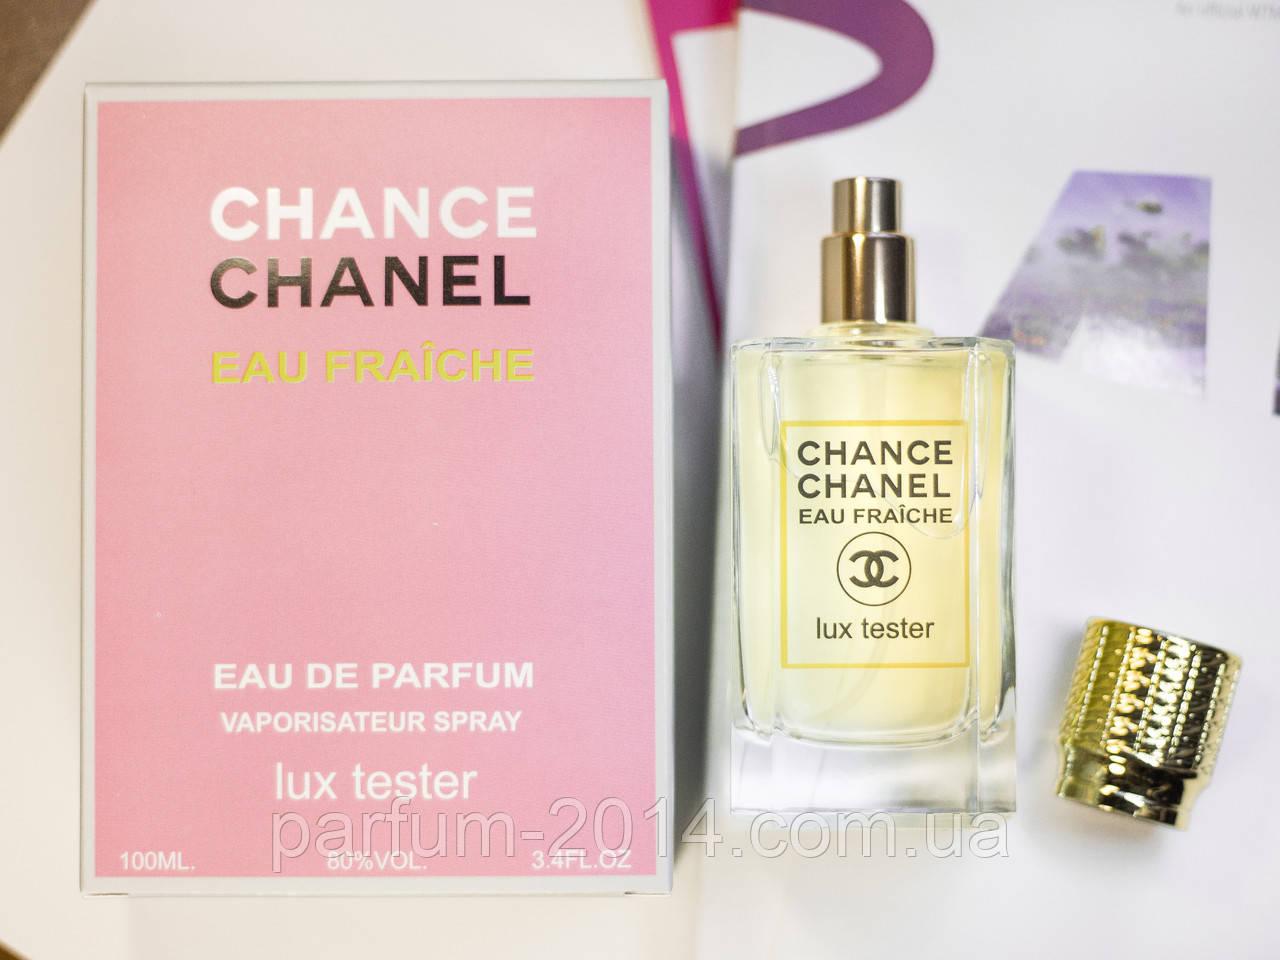 Жіночий аромат шанс еу фреш Chance Eau Fraiche 100 мл (осіб) парфуми парфуми запах тестер пробник tester